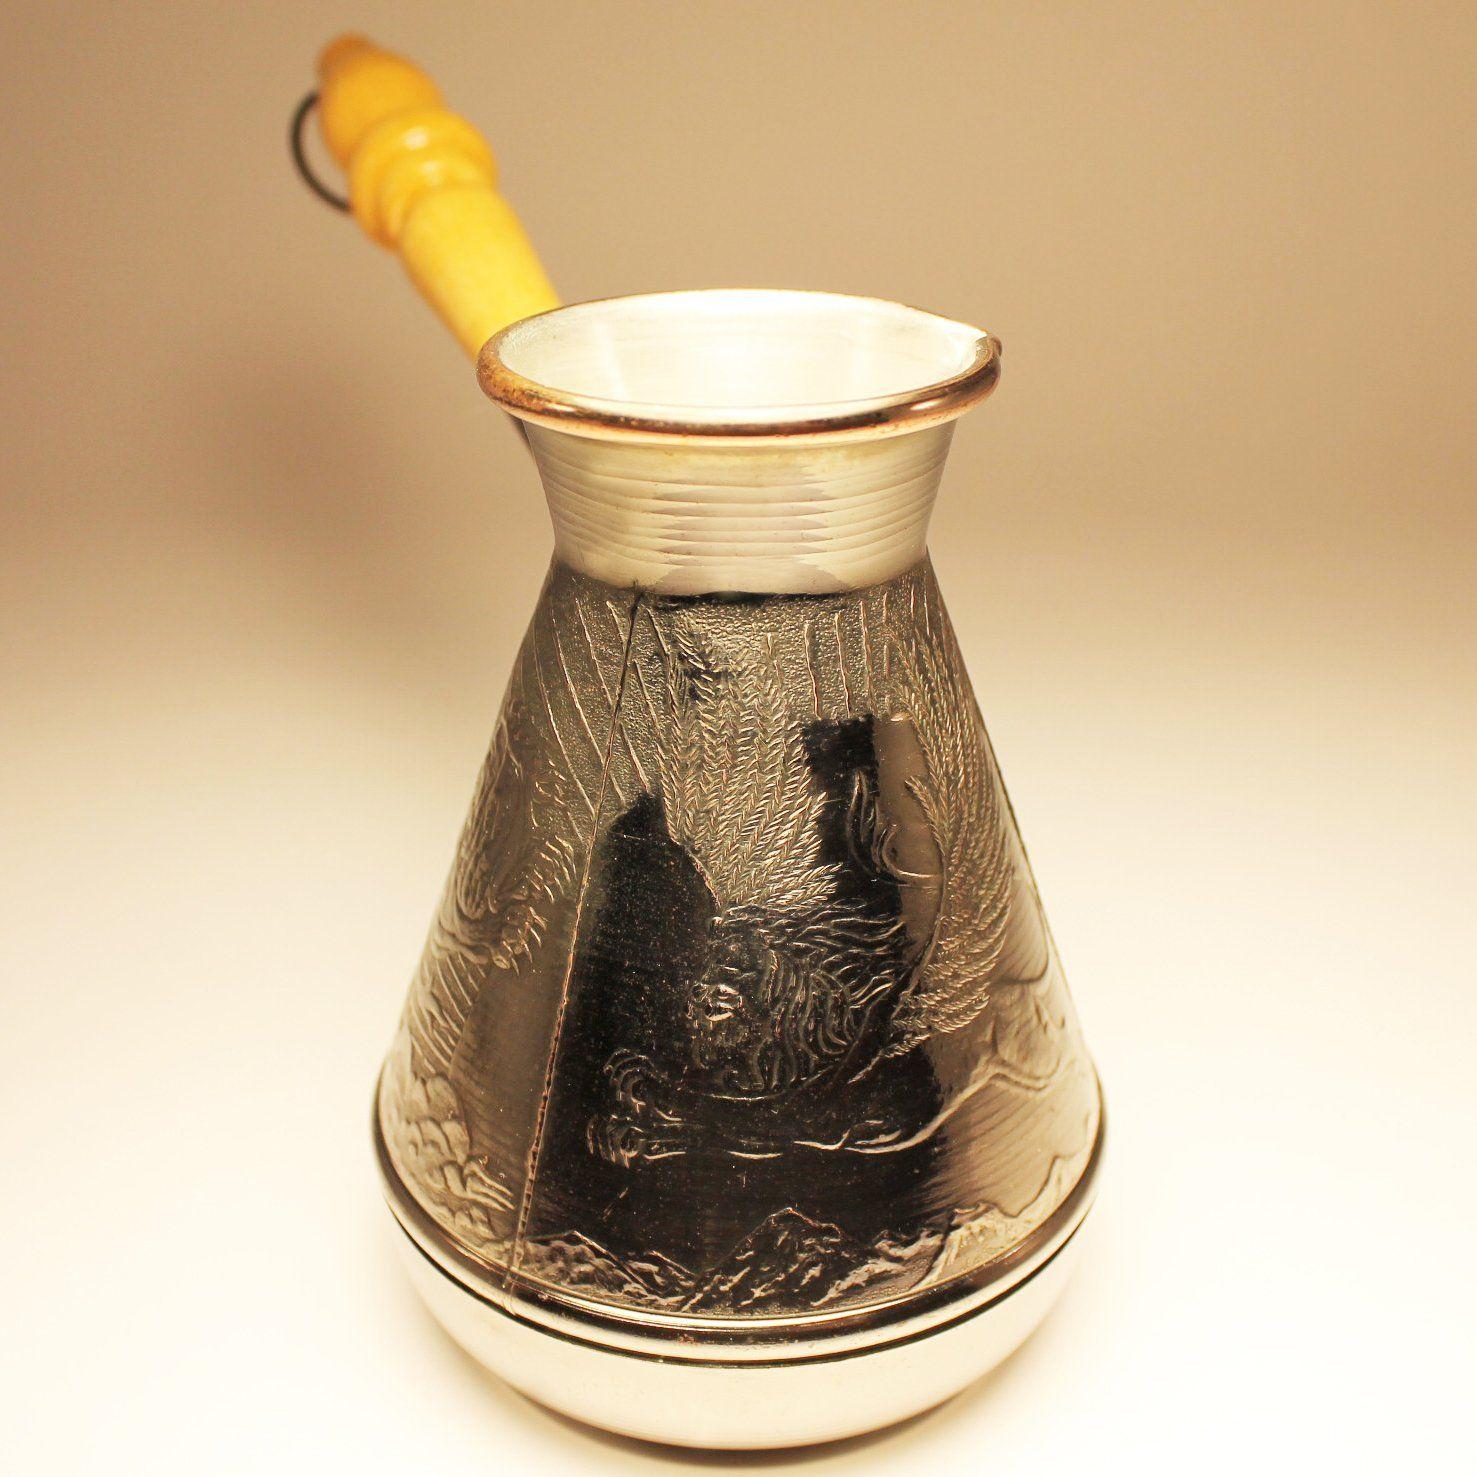 719itlppwyl_sl1500_jpg turkish coffee coffee pot cezve